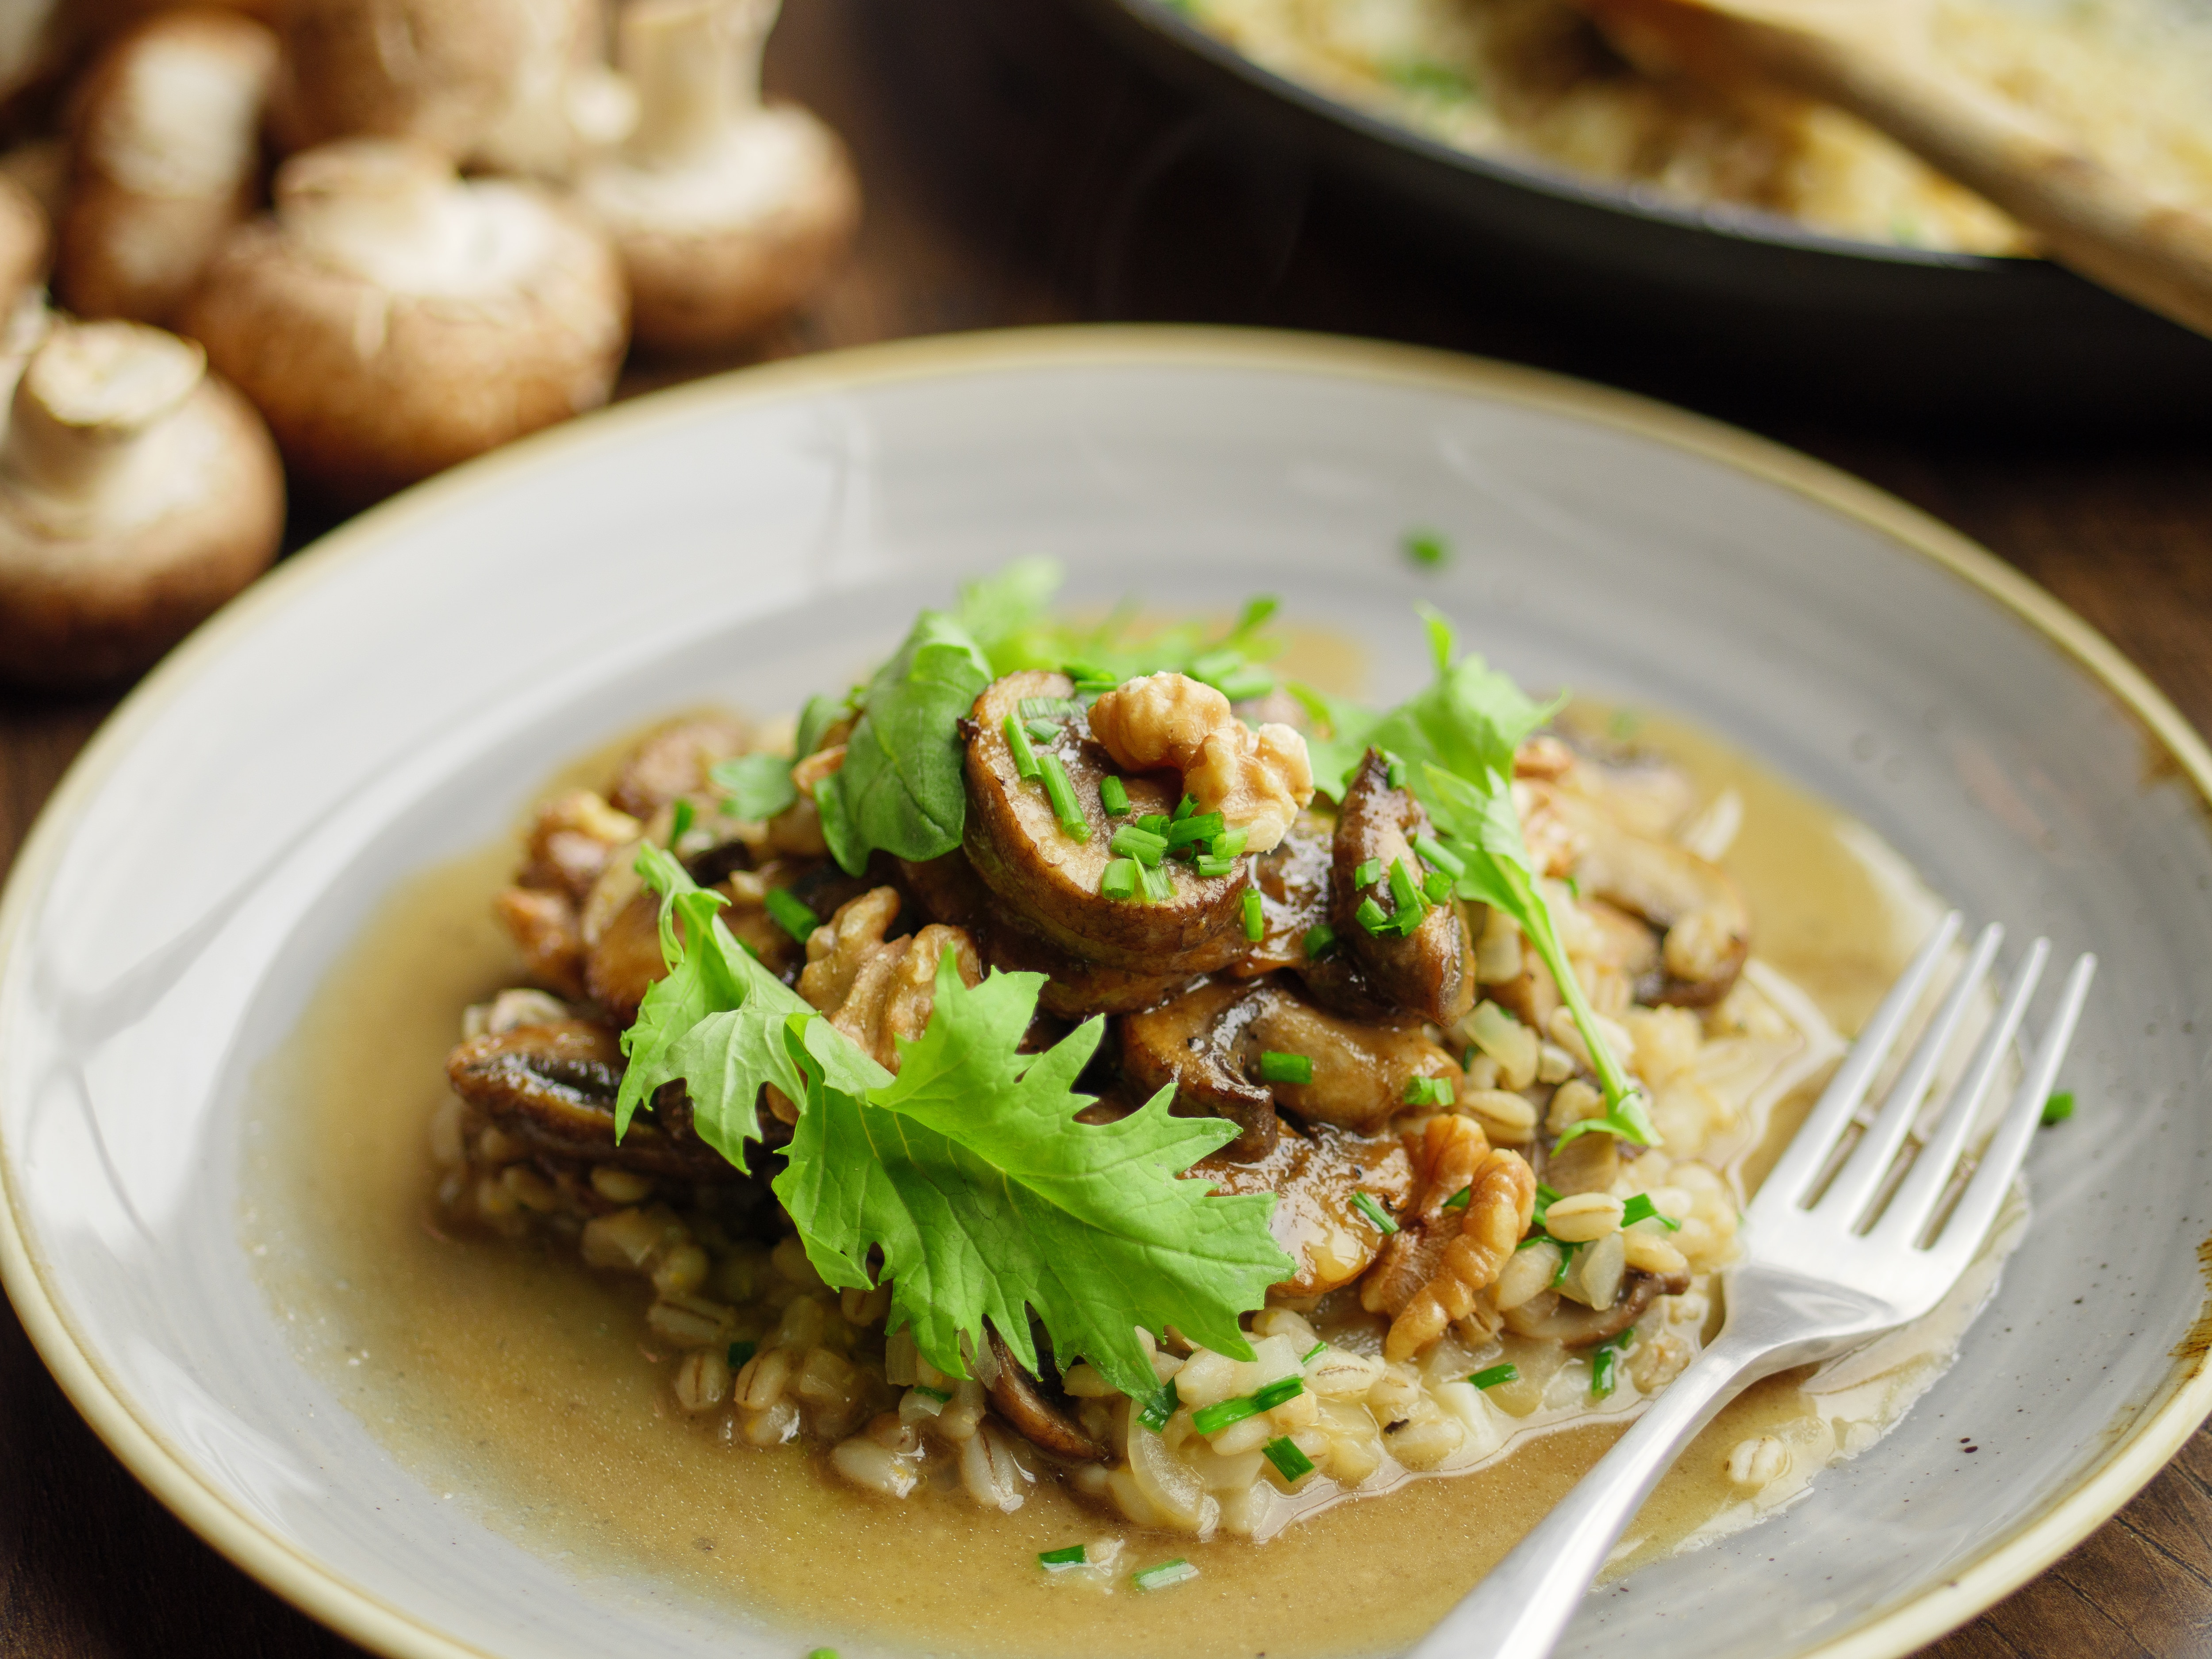 Miso Glazed Mushrooms With Barley